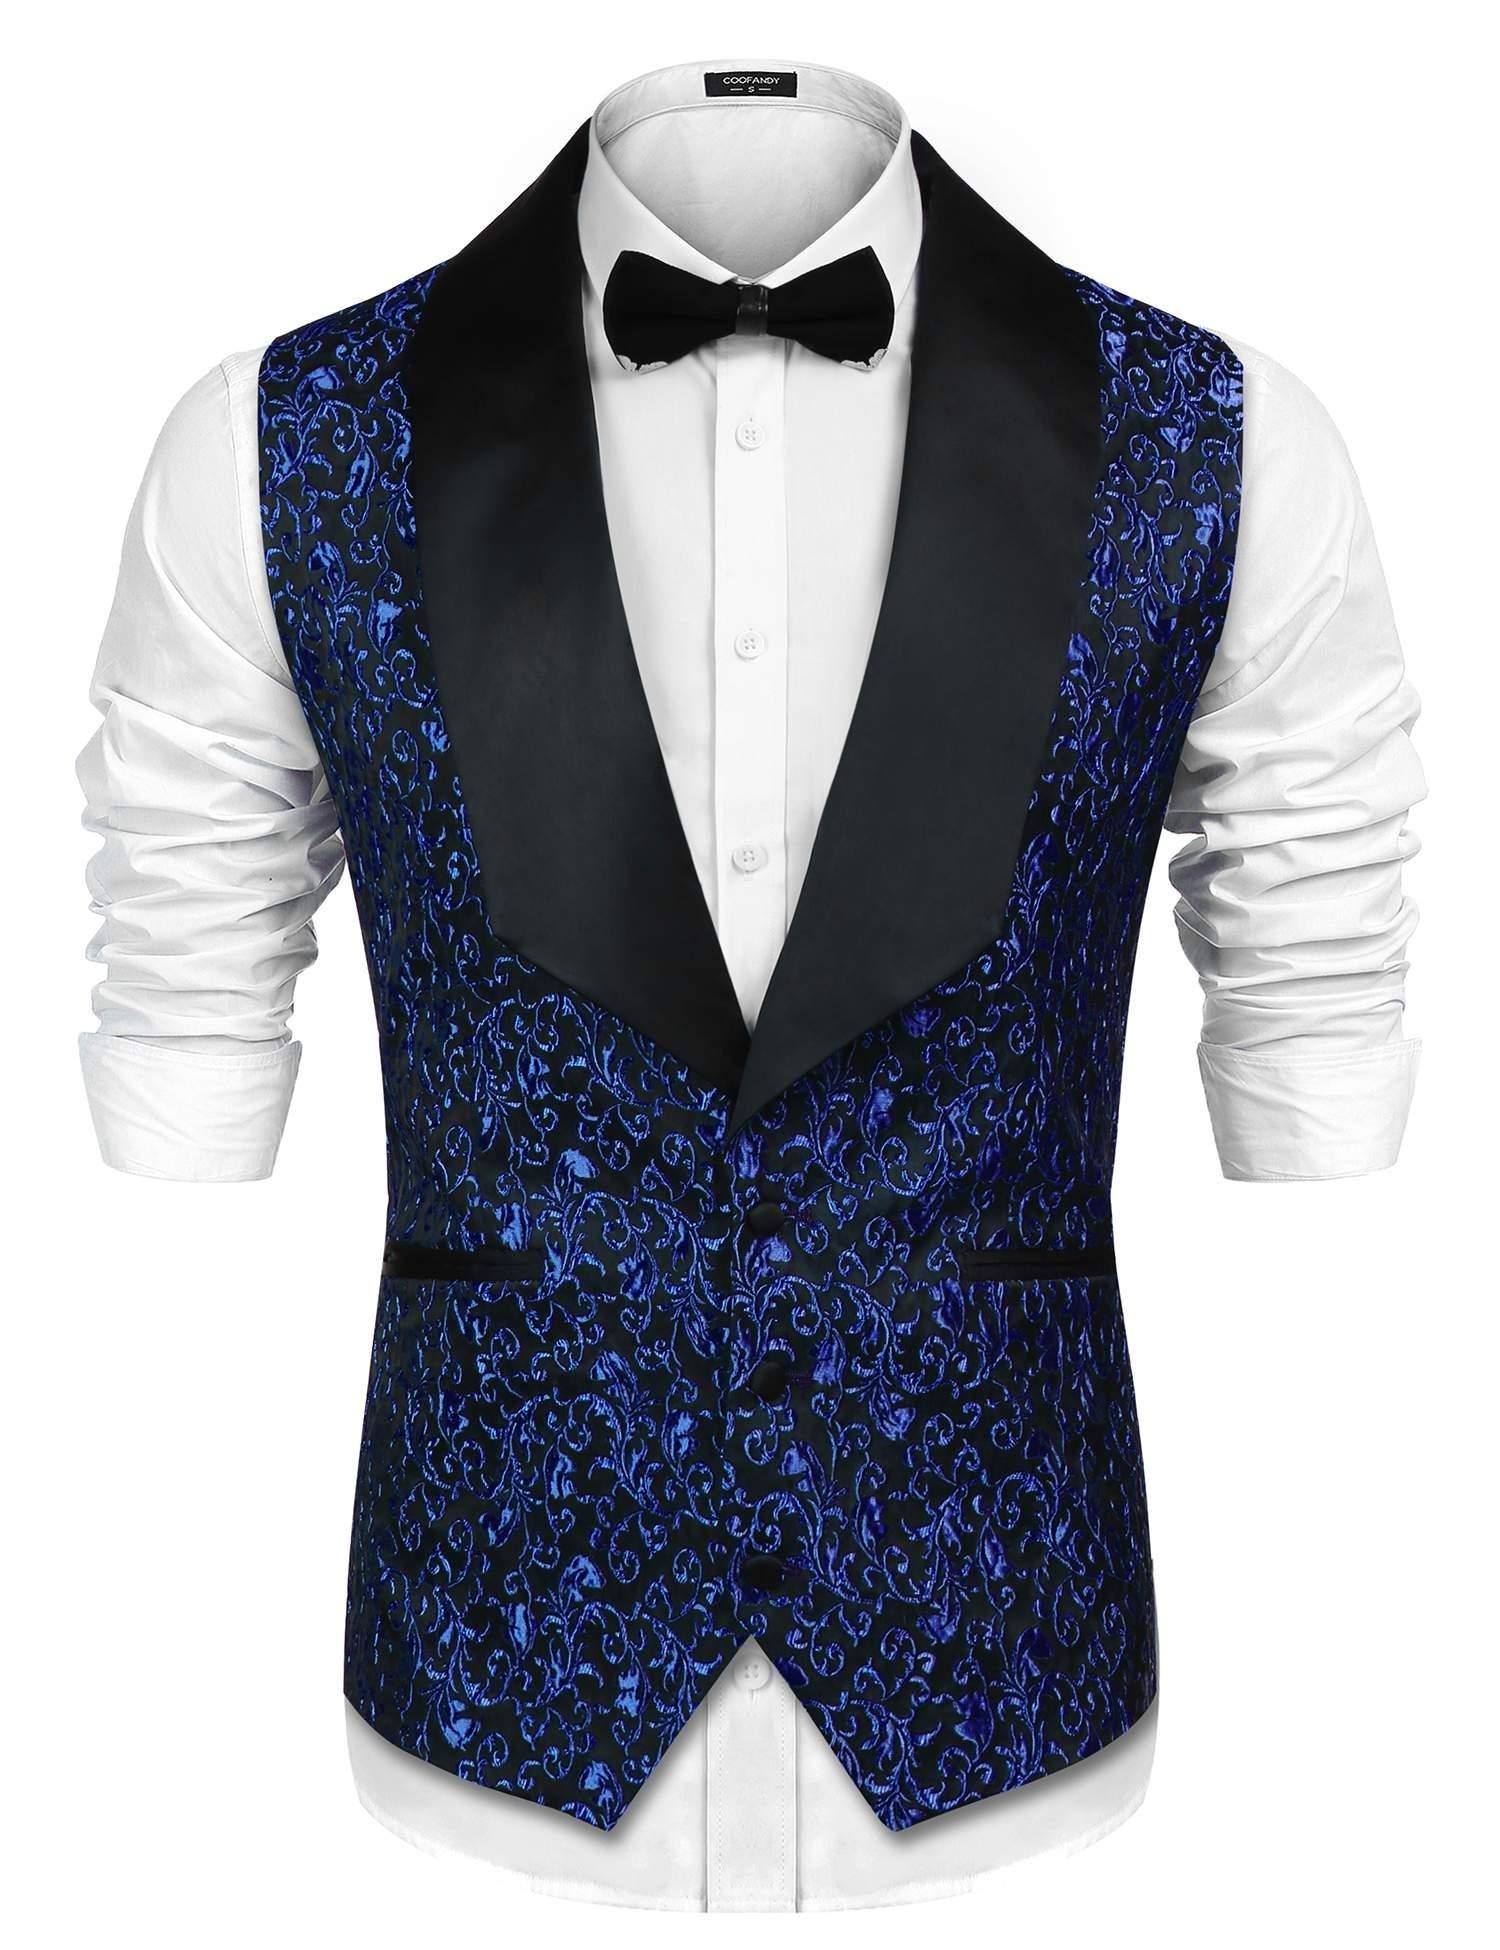 COOFANDY Men's Paisley Embroidery Dress Tuxedo Vest Wedding Formal Waistcoat